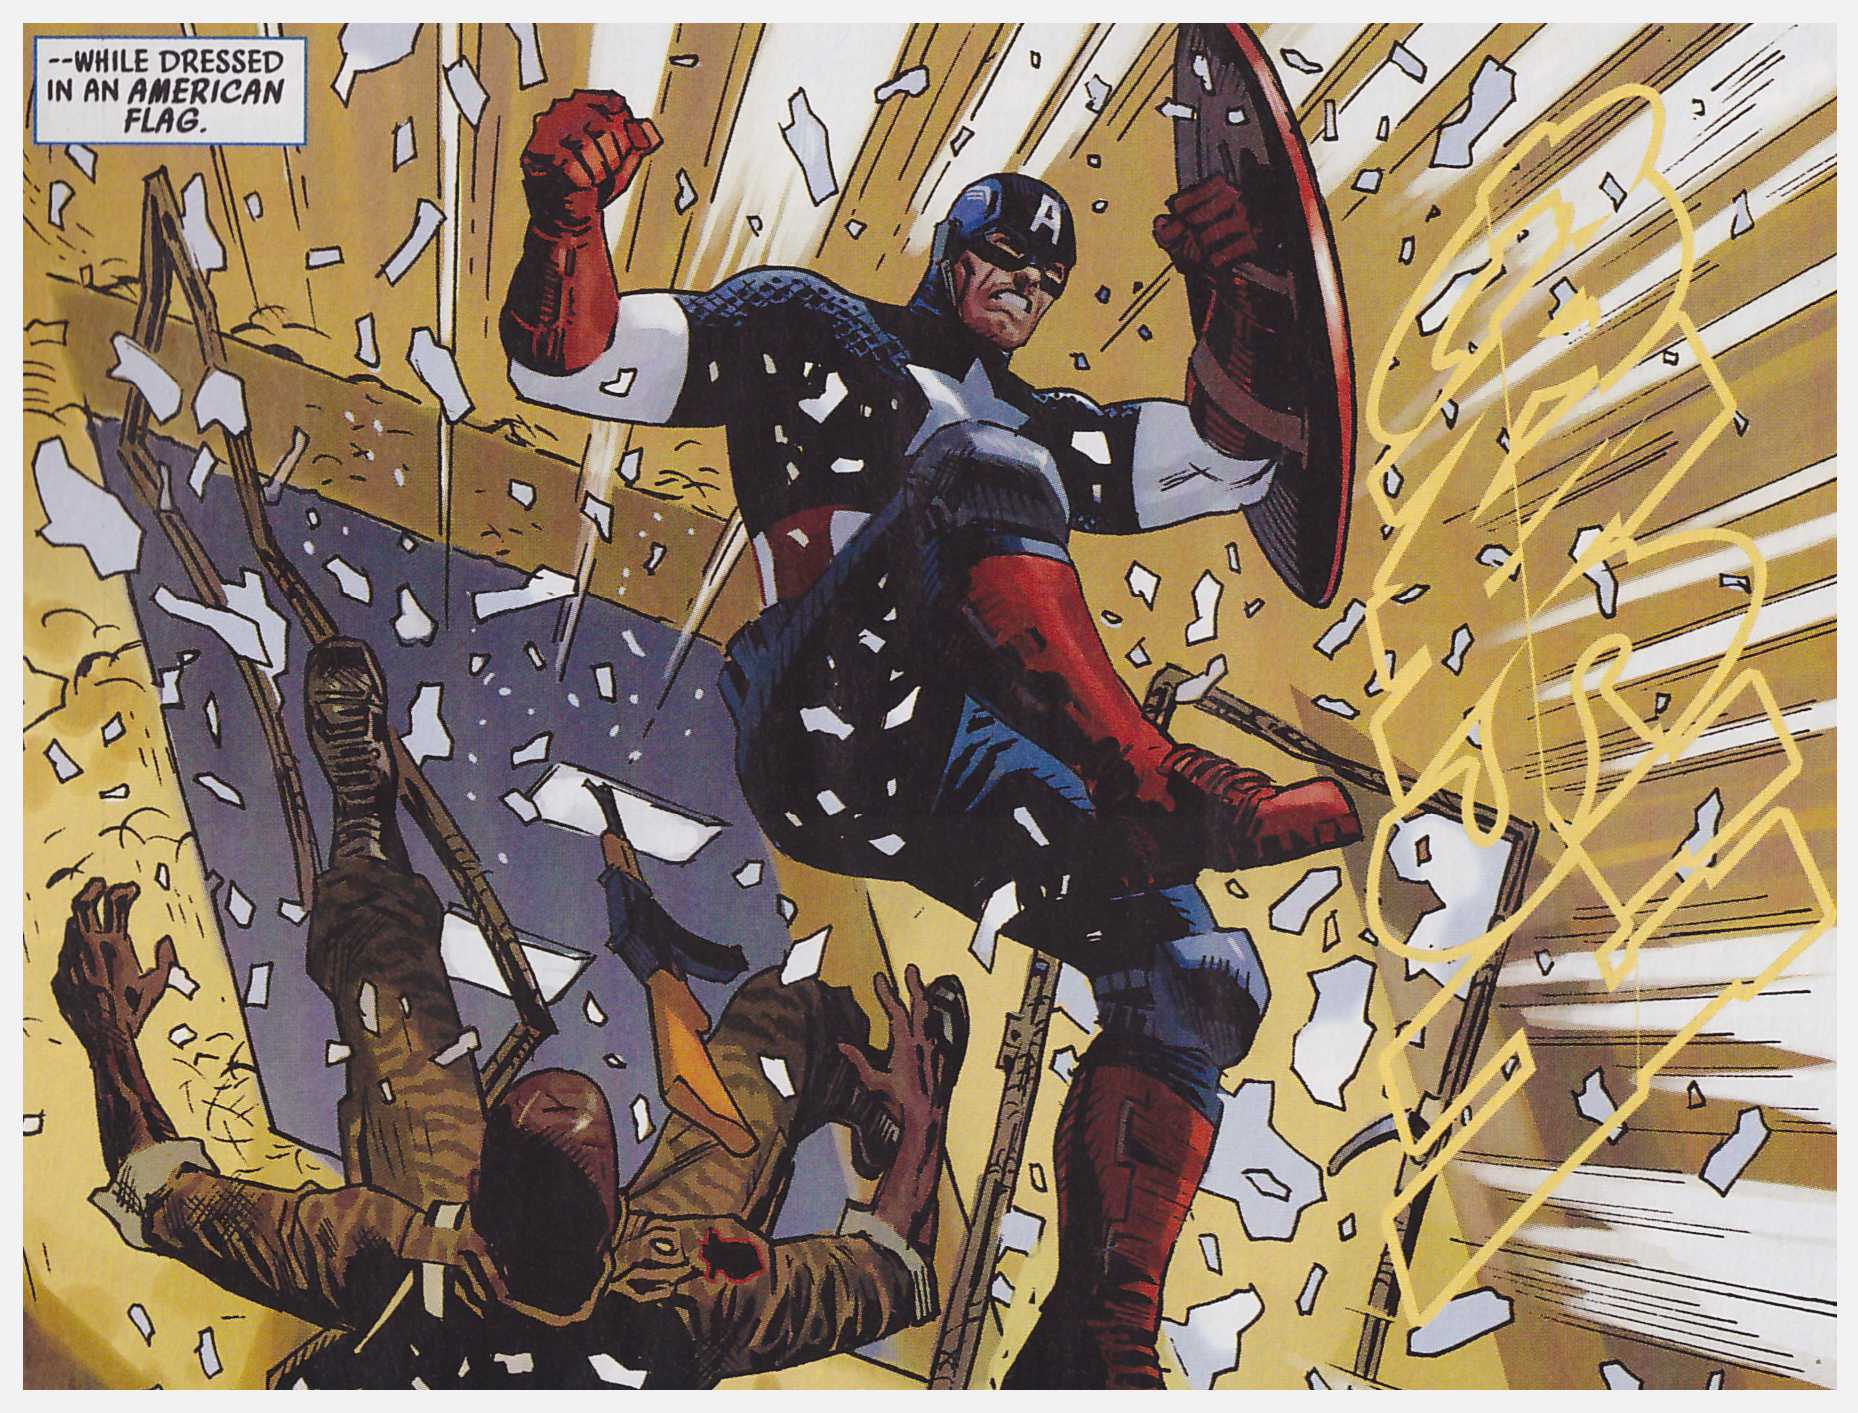 Uncanny Avengers The Apocalypse Twins review